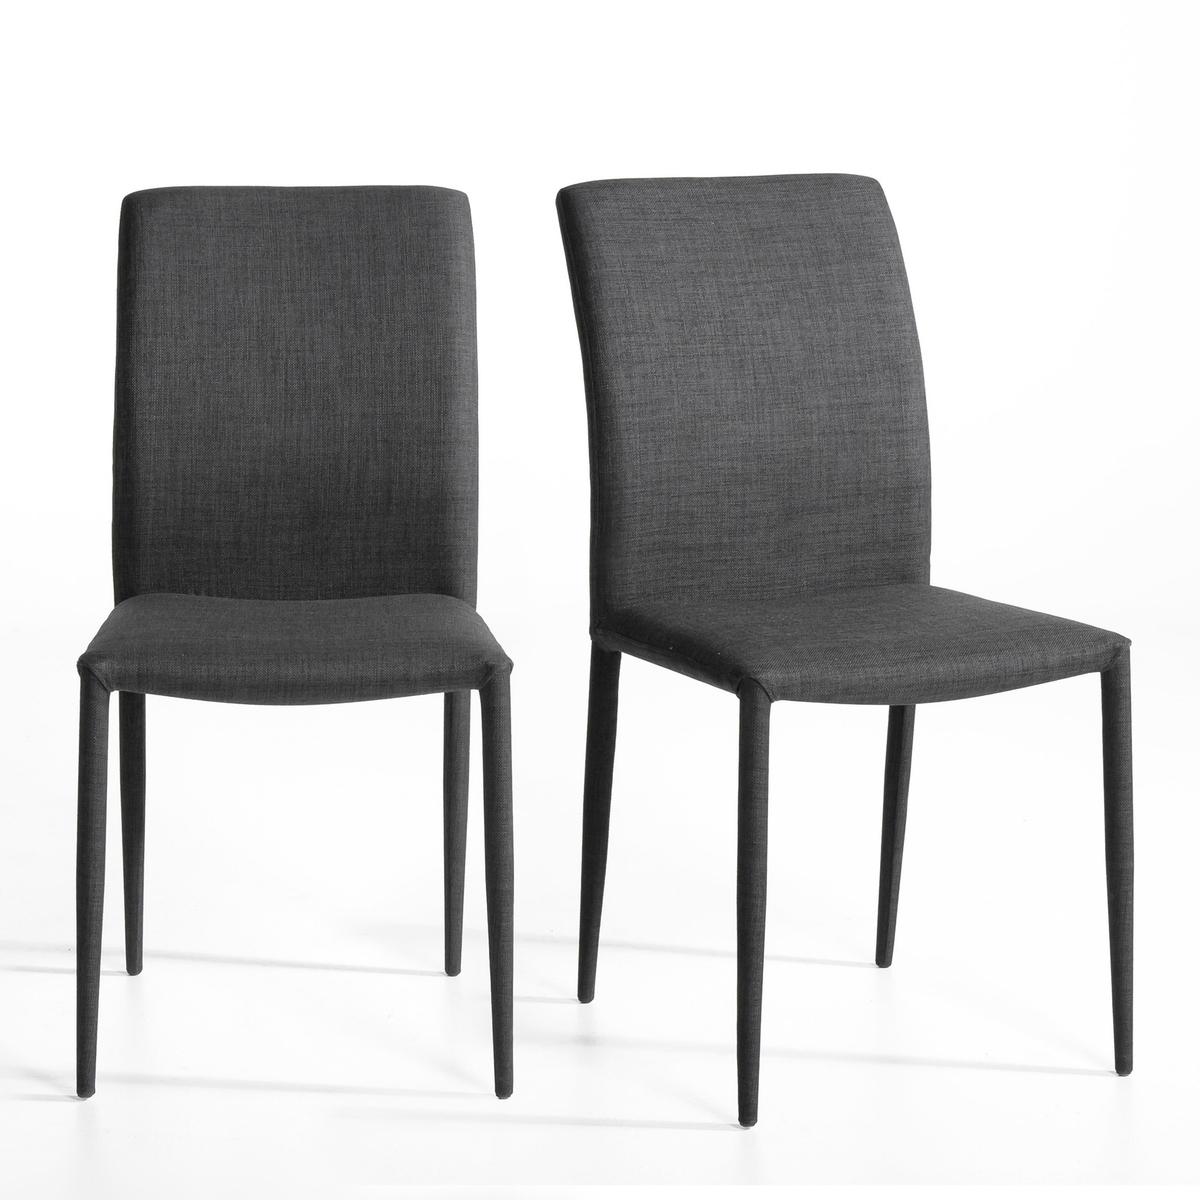 2 стула из ткани, Bitume